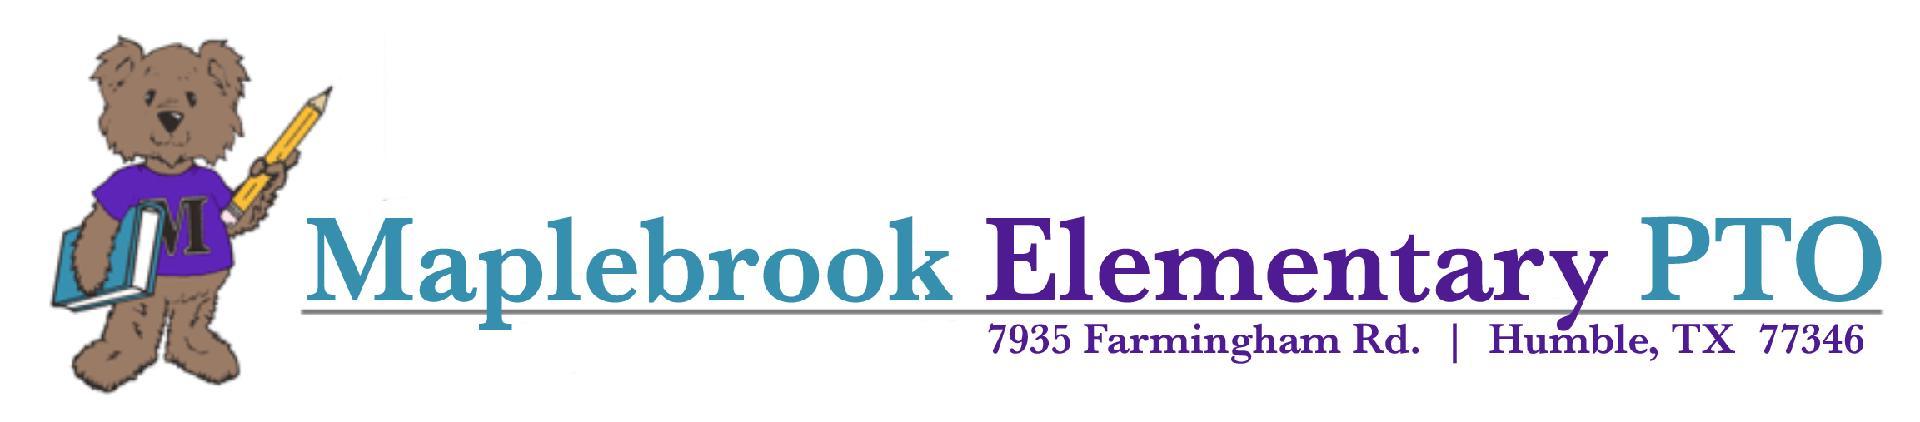 Maplebrook Elementary PTO